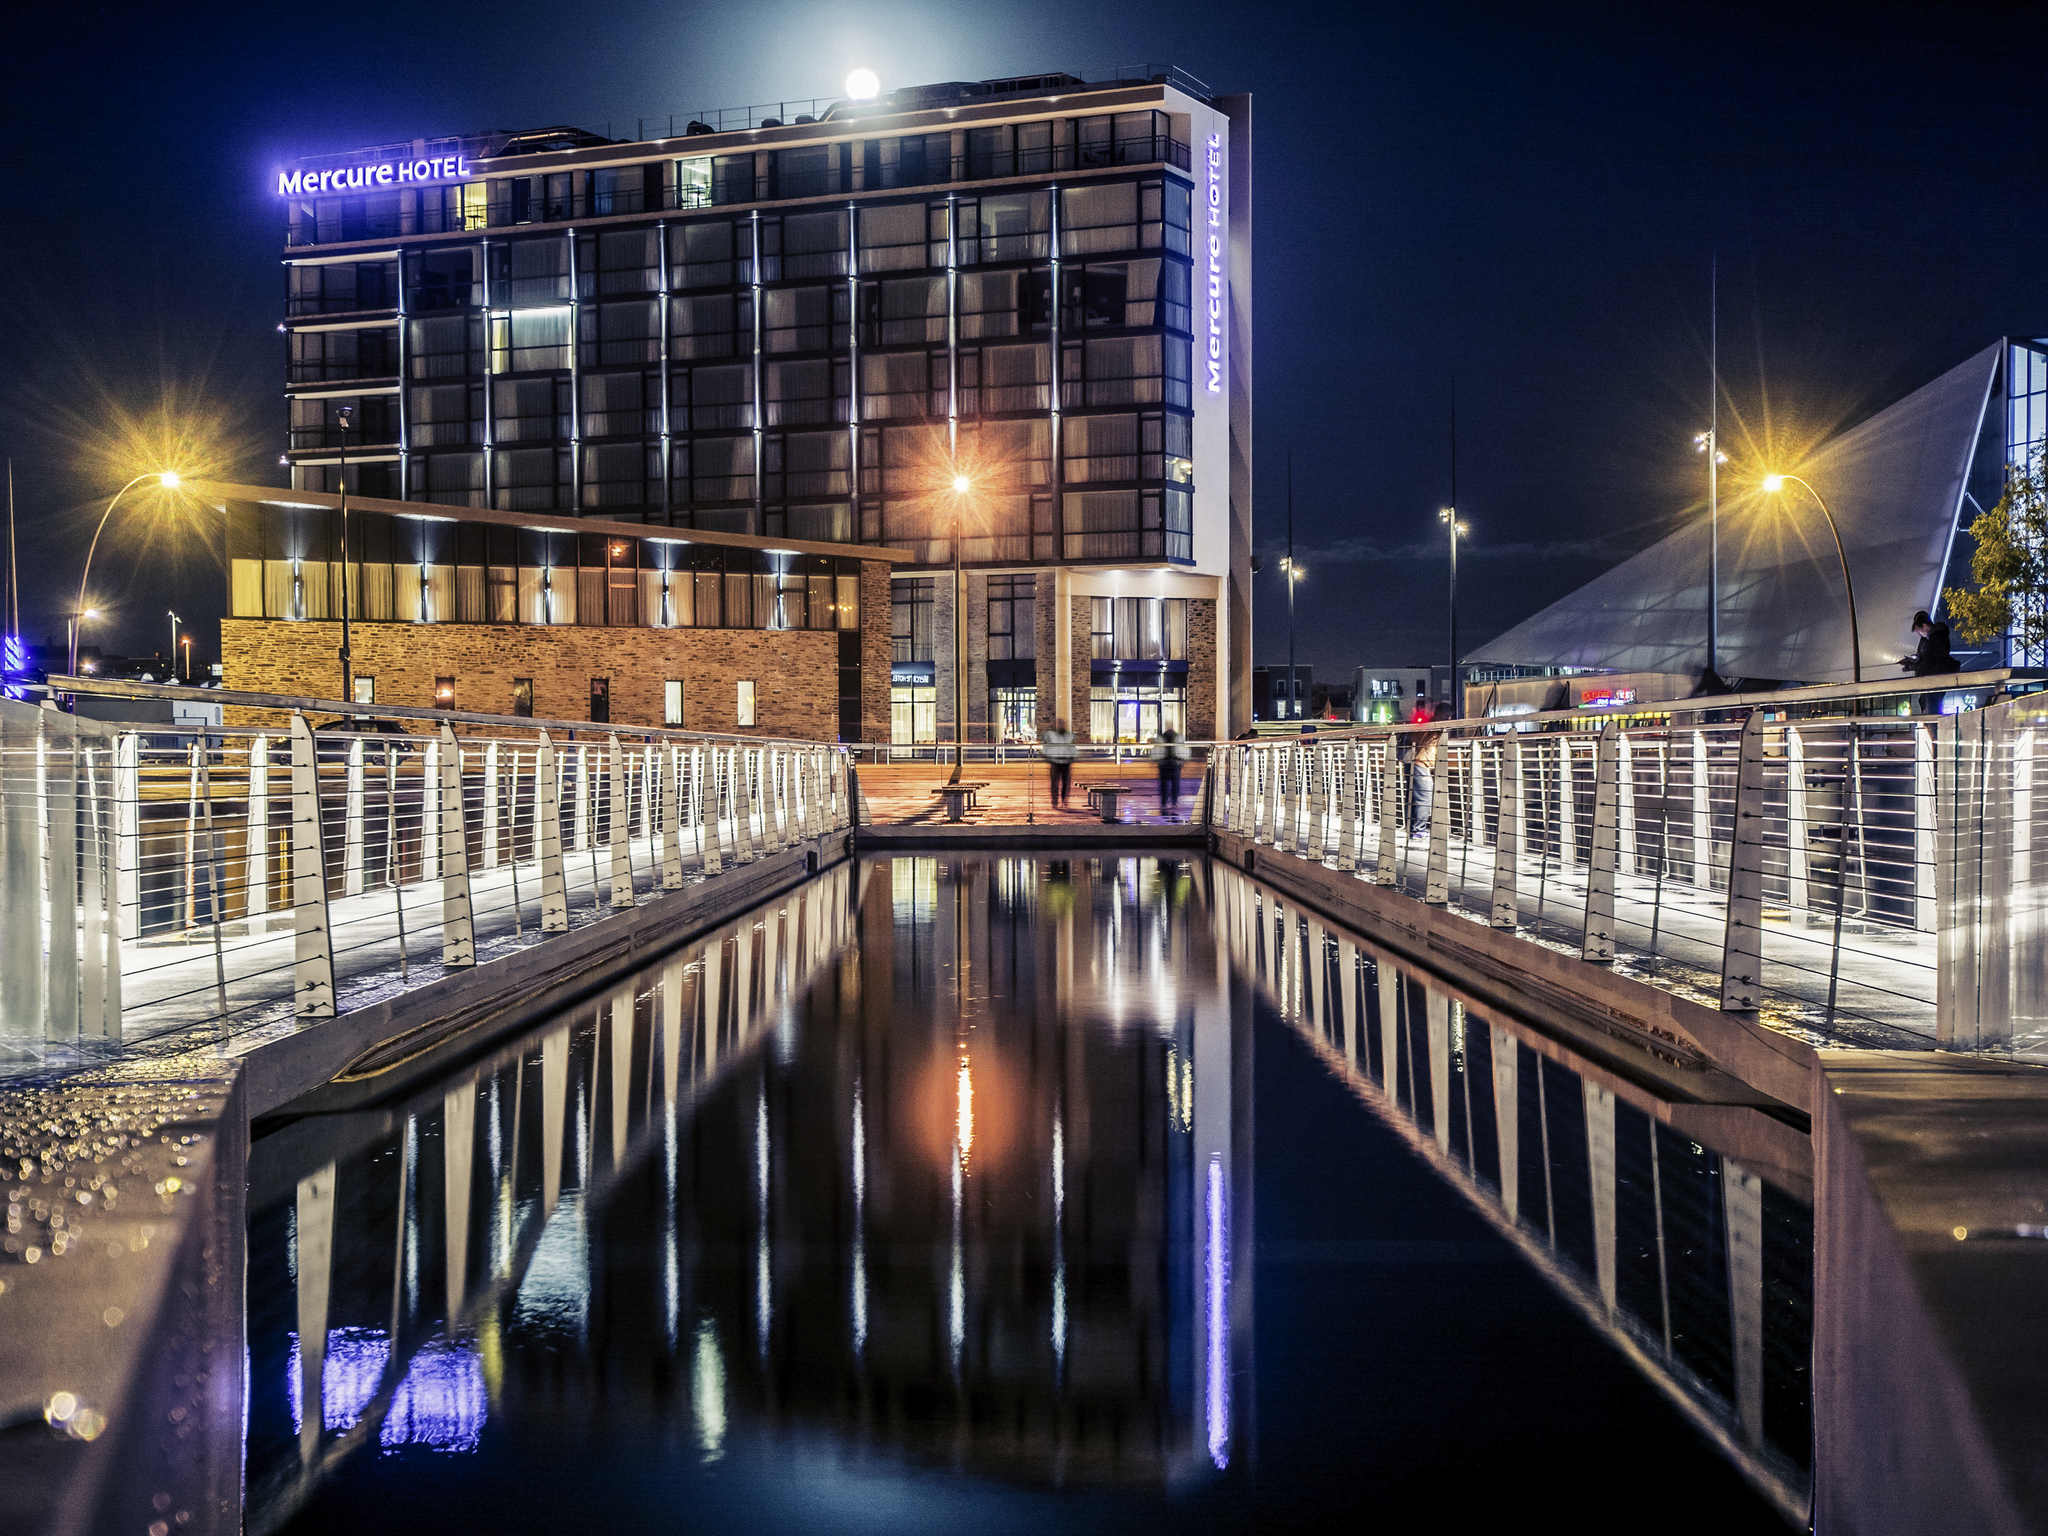 Hotel - Mercure Cherbourg Centre Port hotel